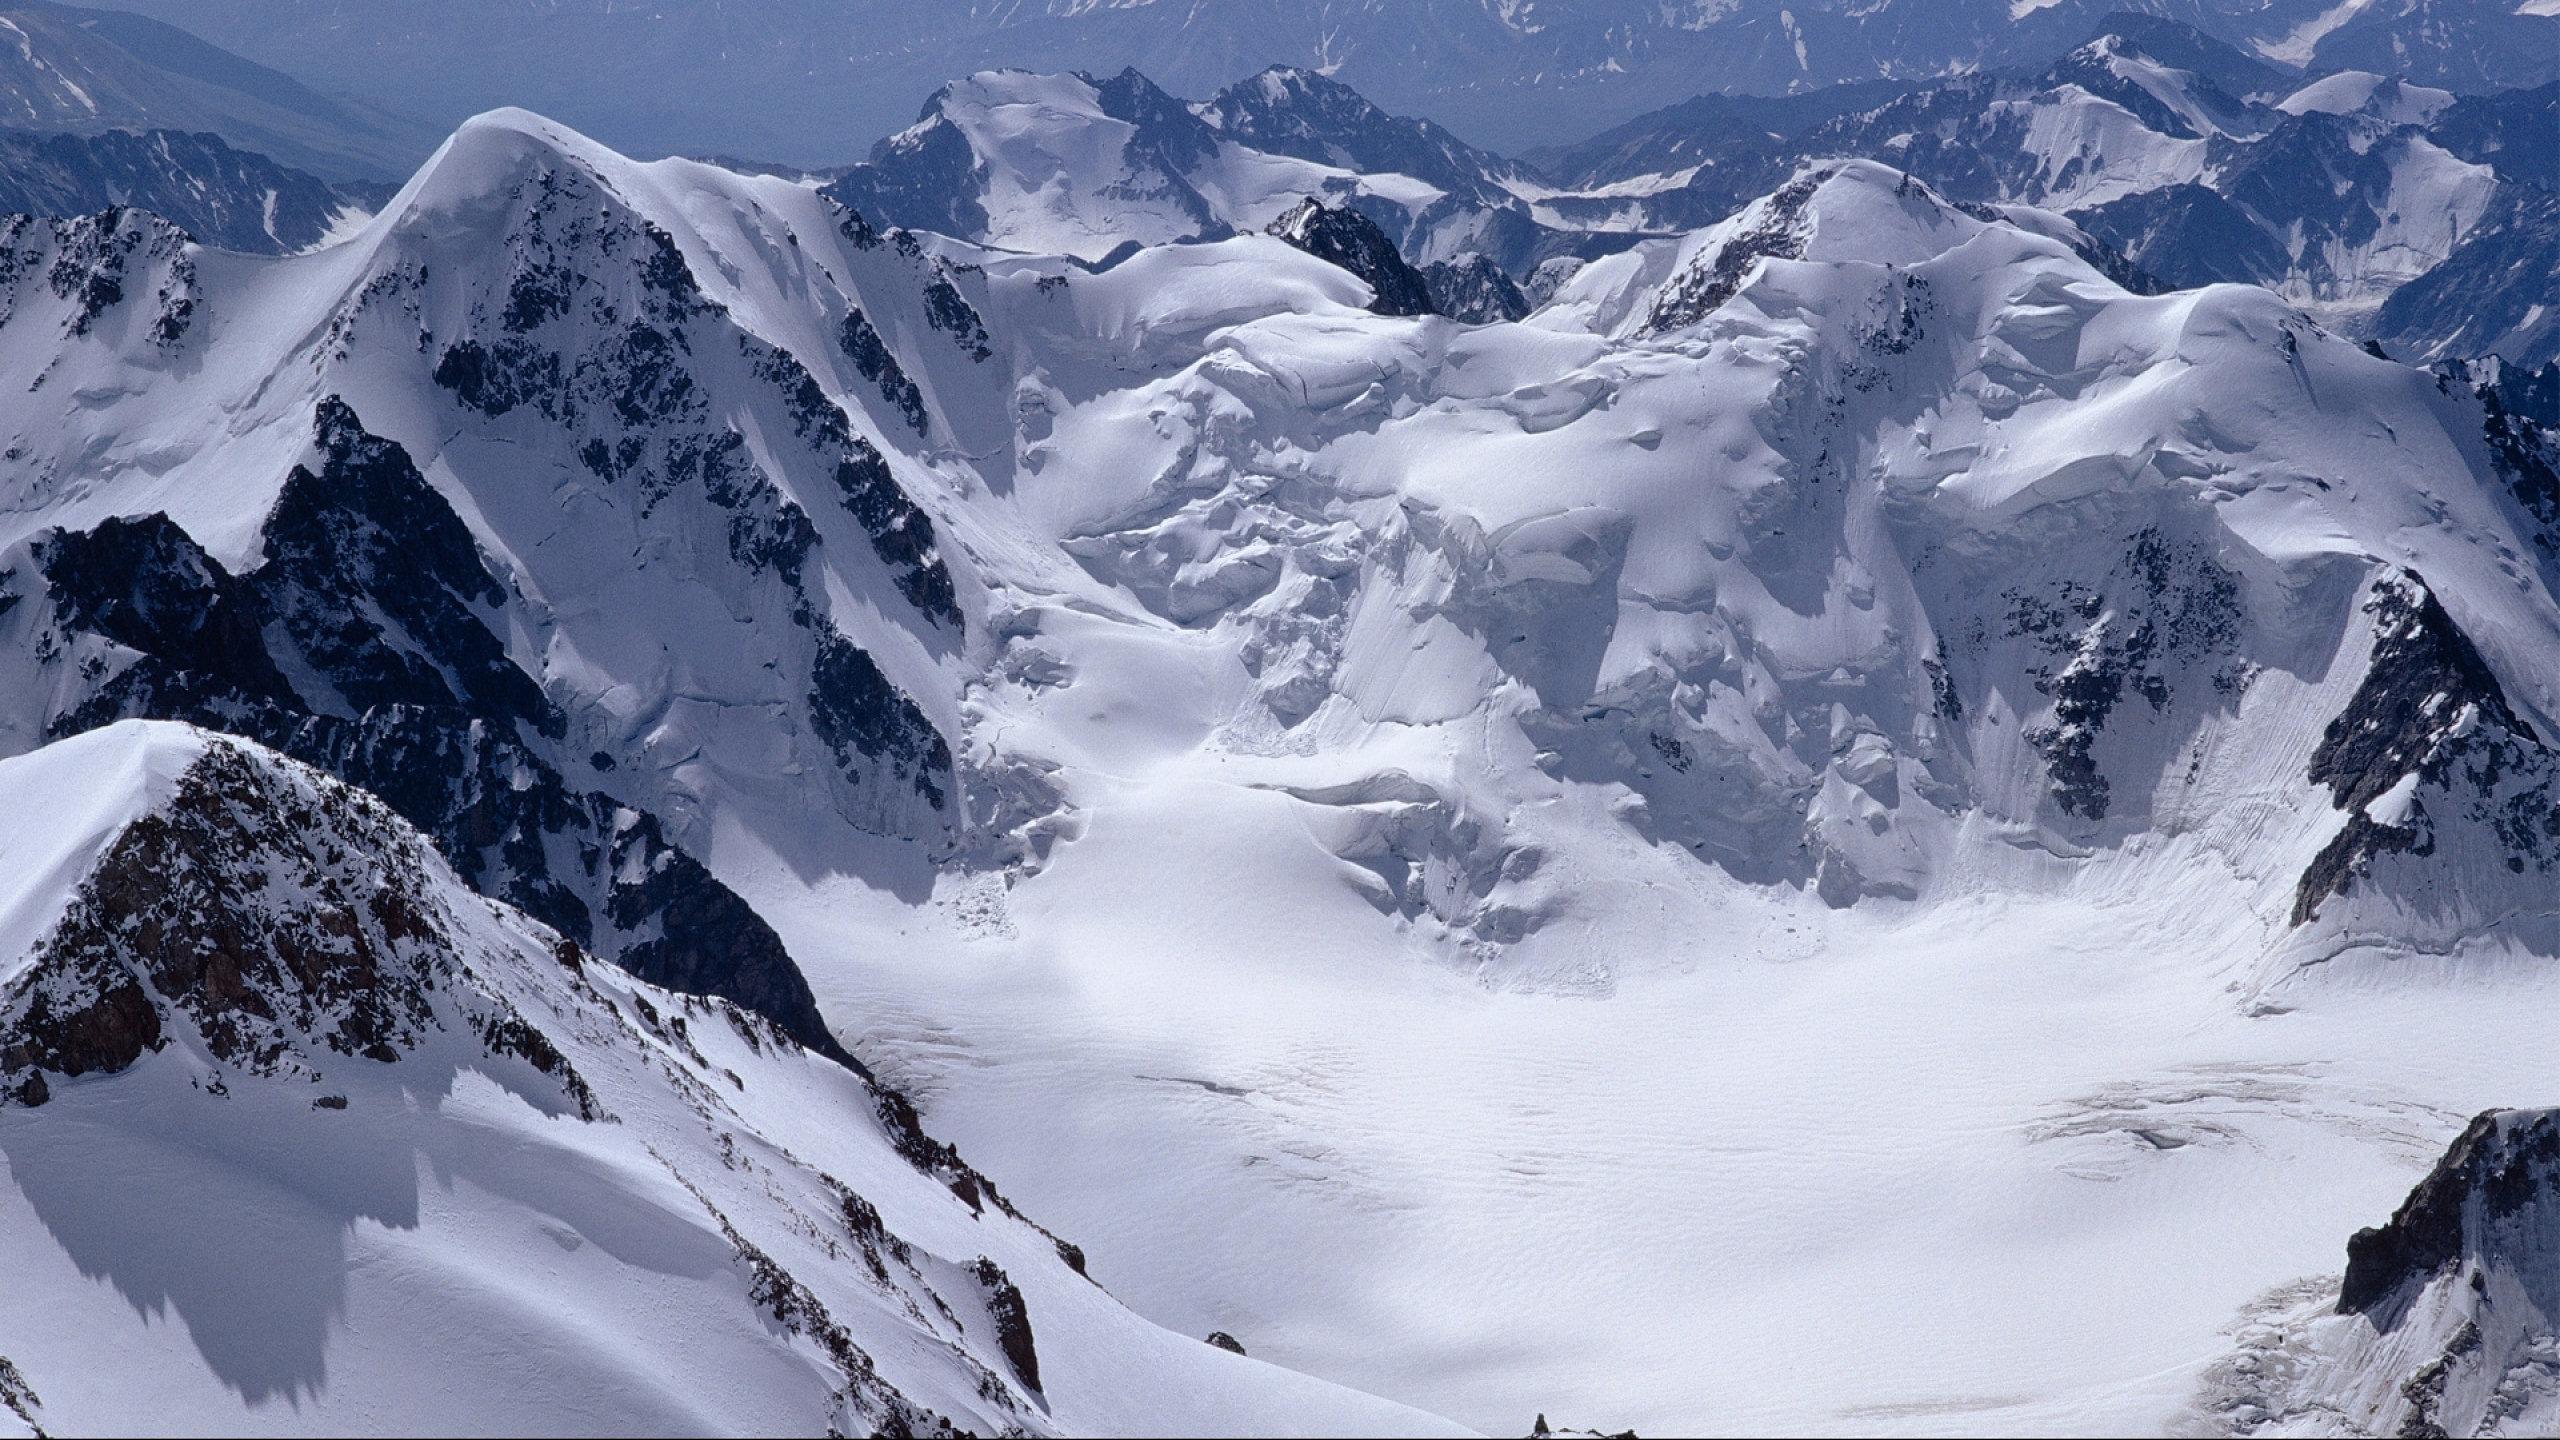 Snow landscape alpine climbers